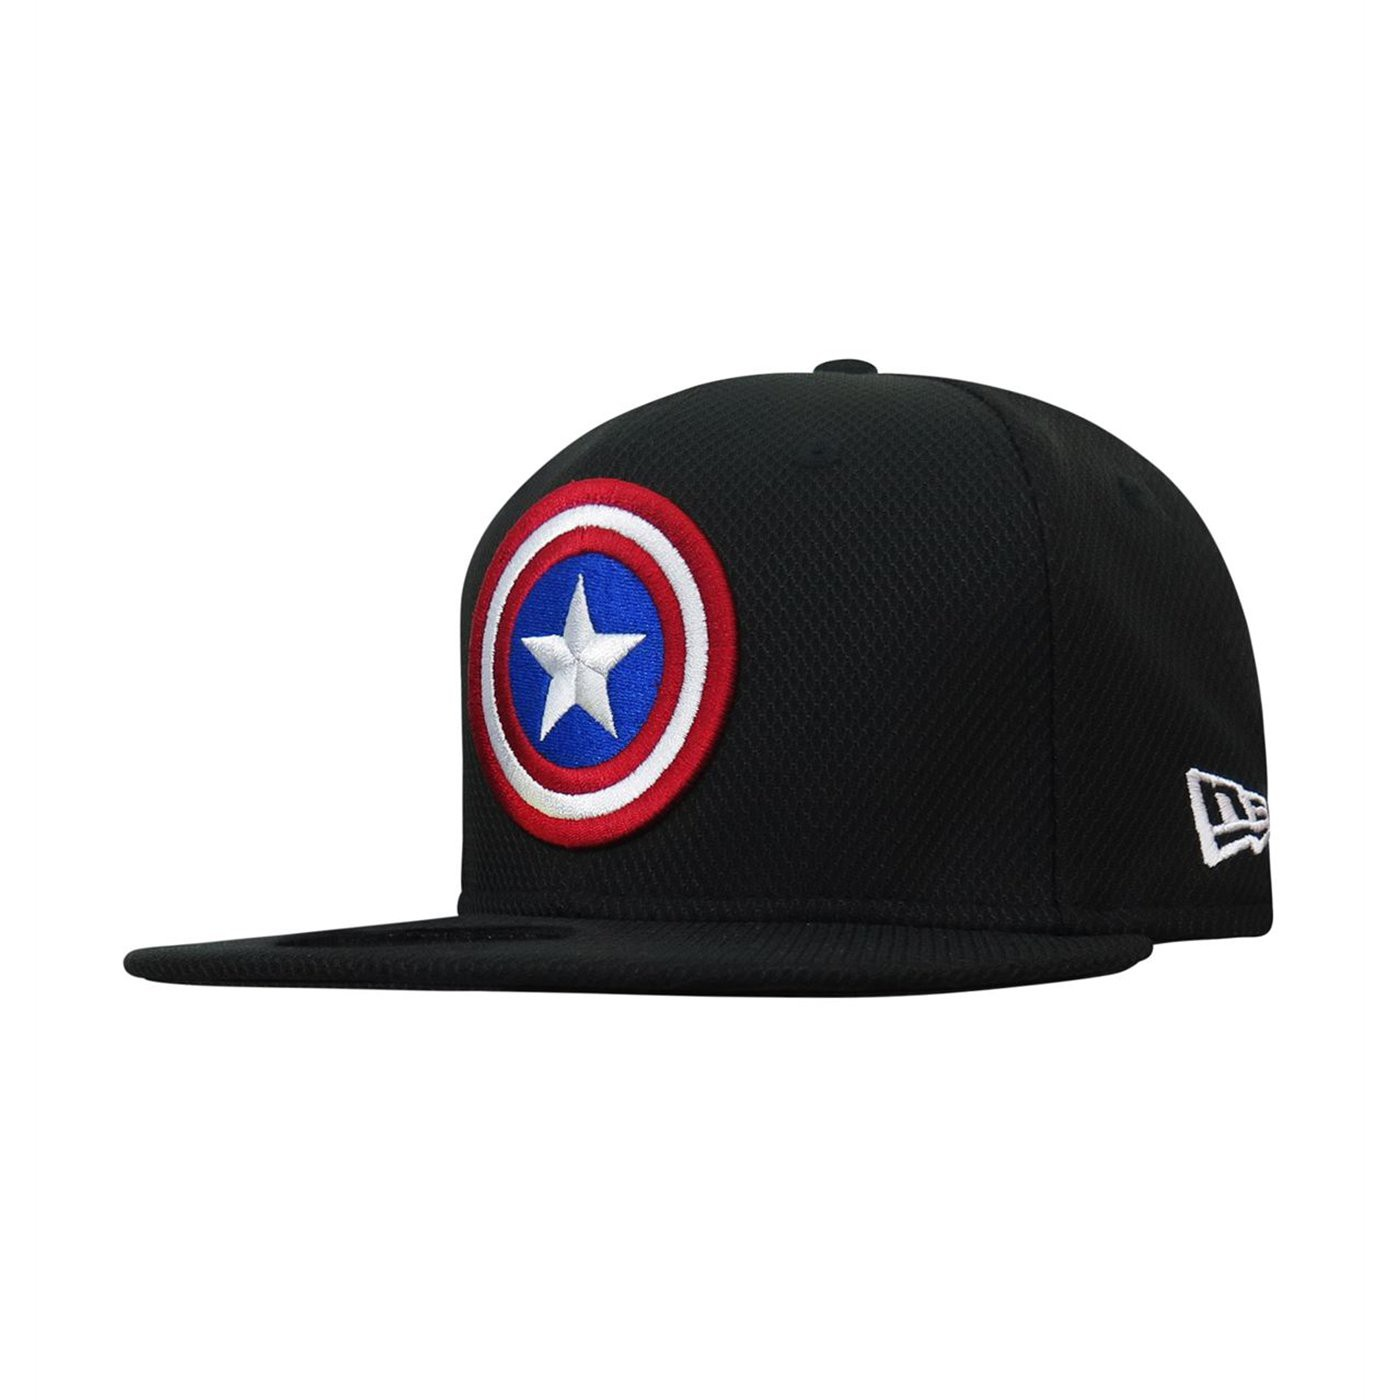 Captain America Symbol On Black 9Fifty Adjustable Hat